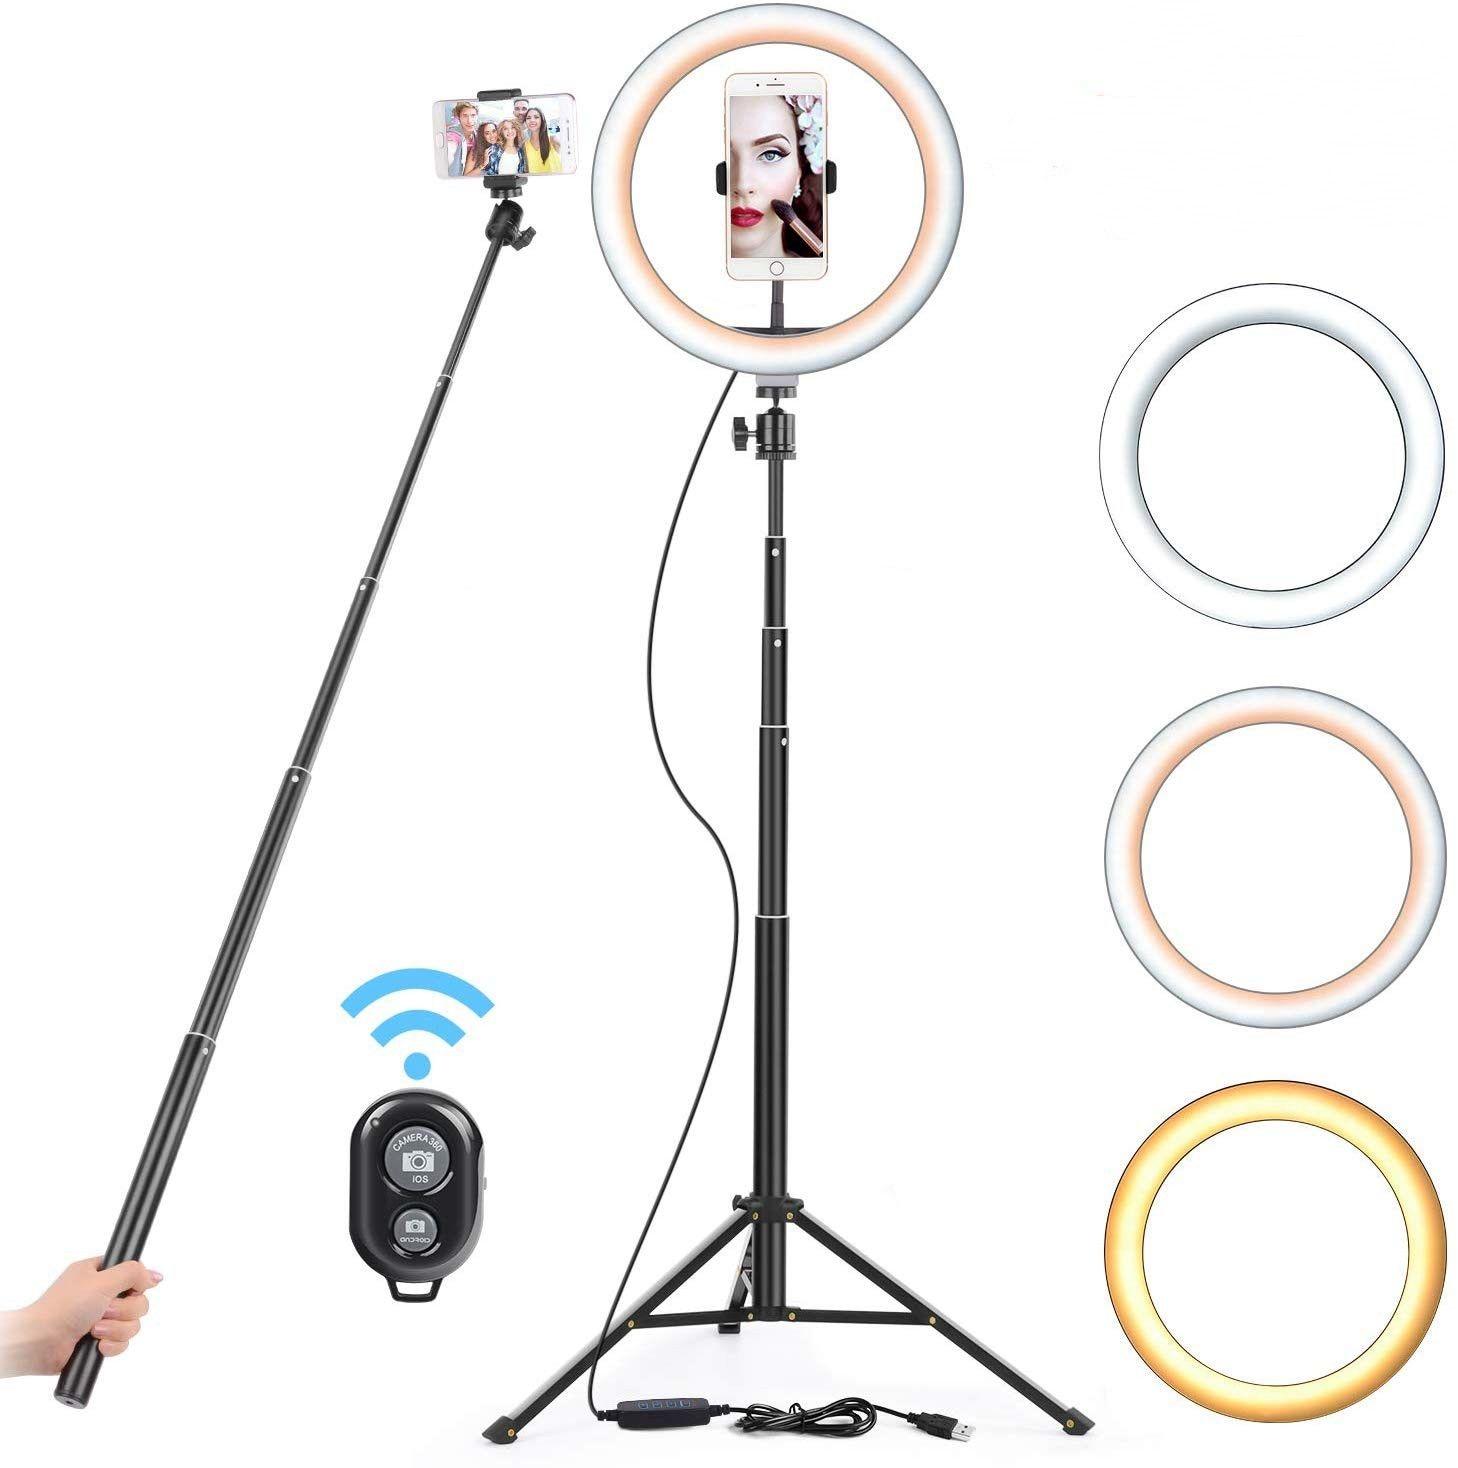 16 26cm USB LED Licht Ring Fotografie Blitz Lampe Mit 130cm Stativ Für Make-Up Youtube VK Tik tok Video Dimmbare Beleuchtung